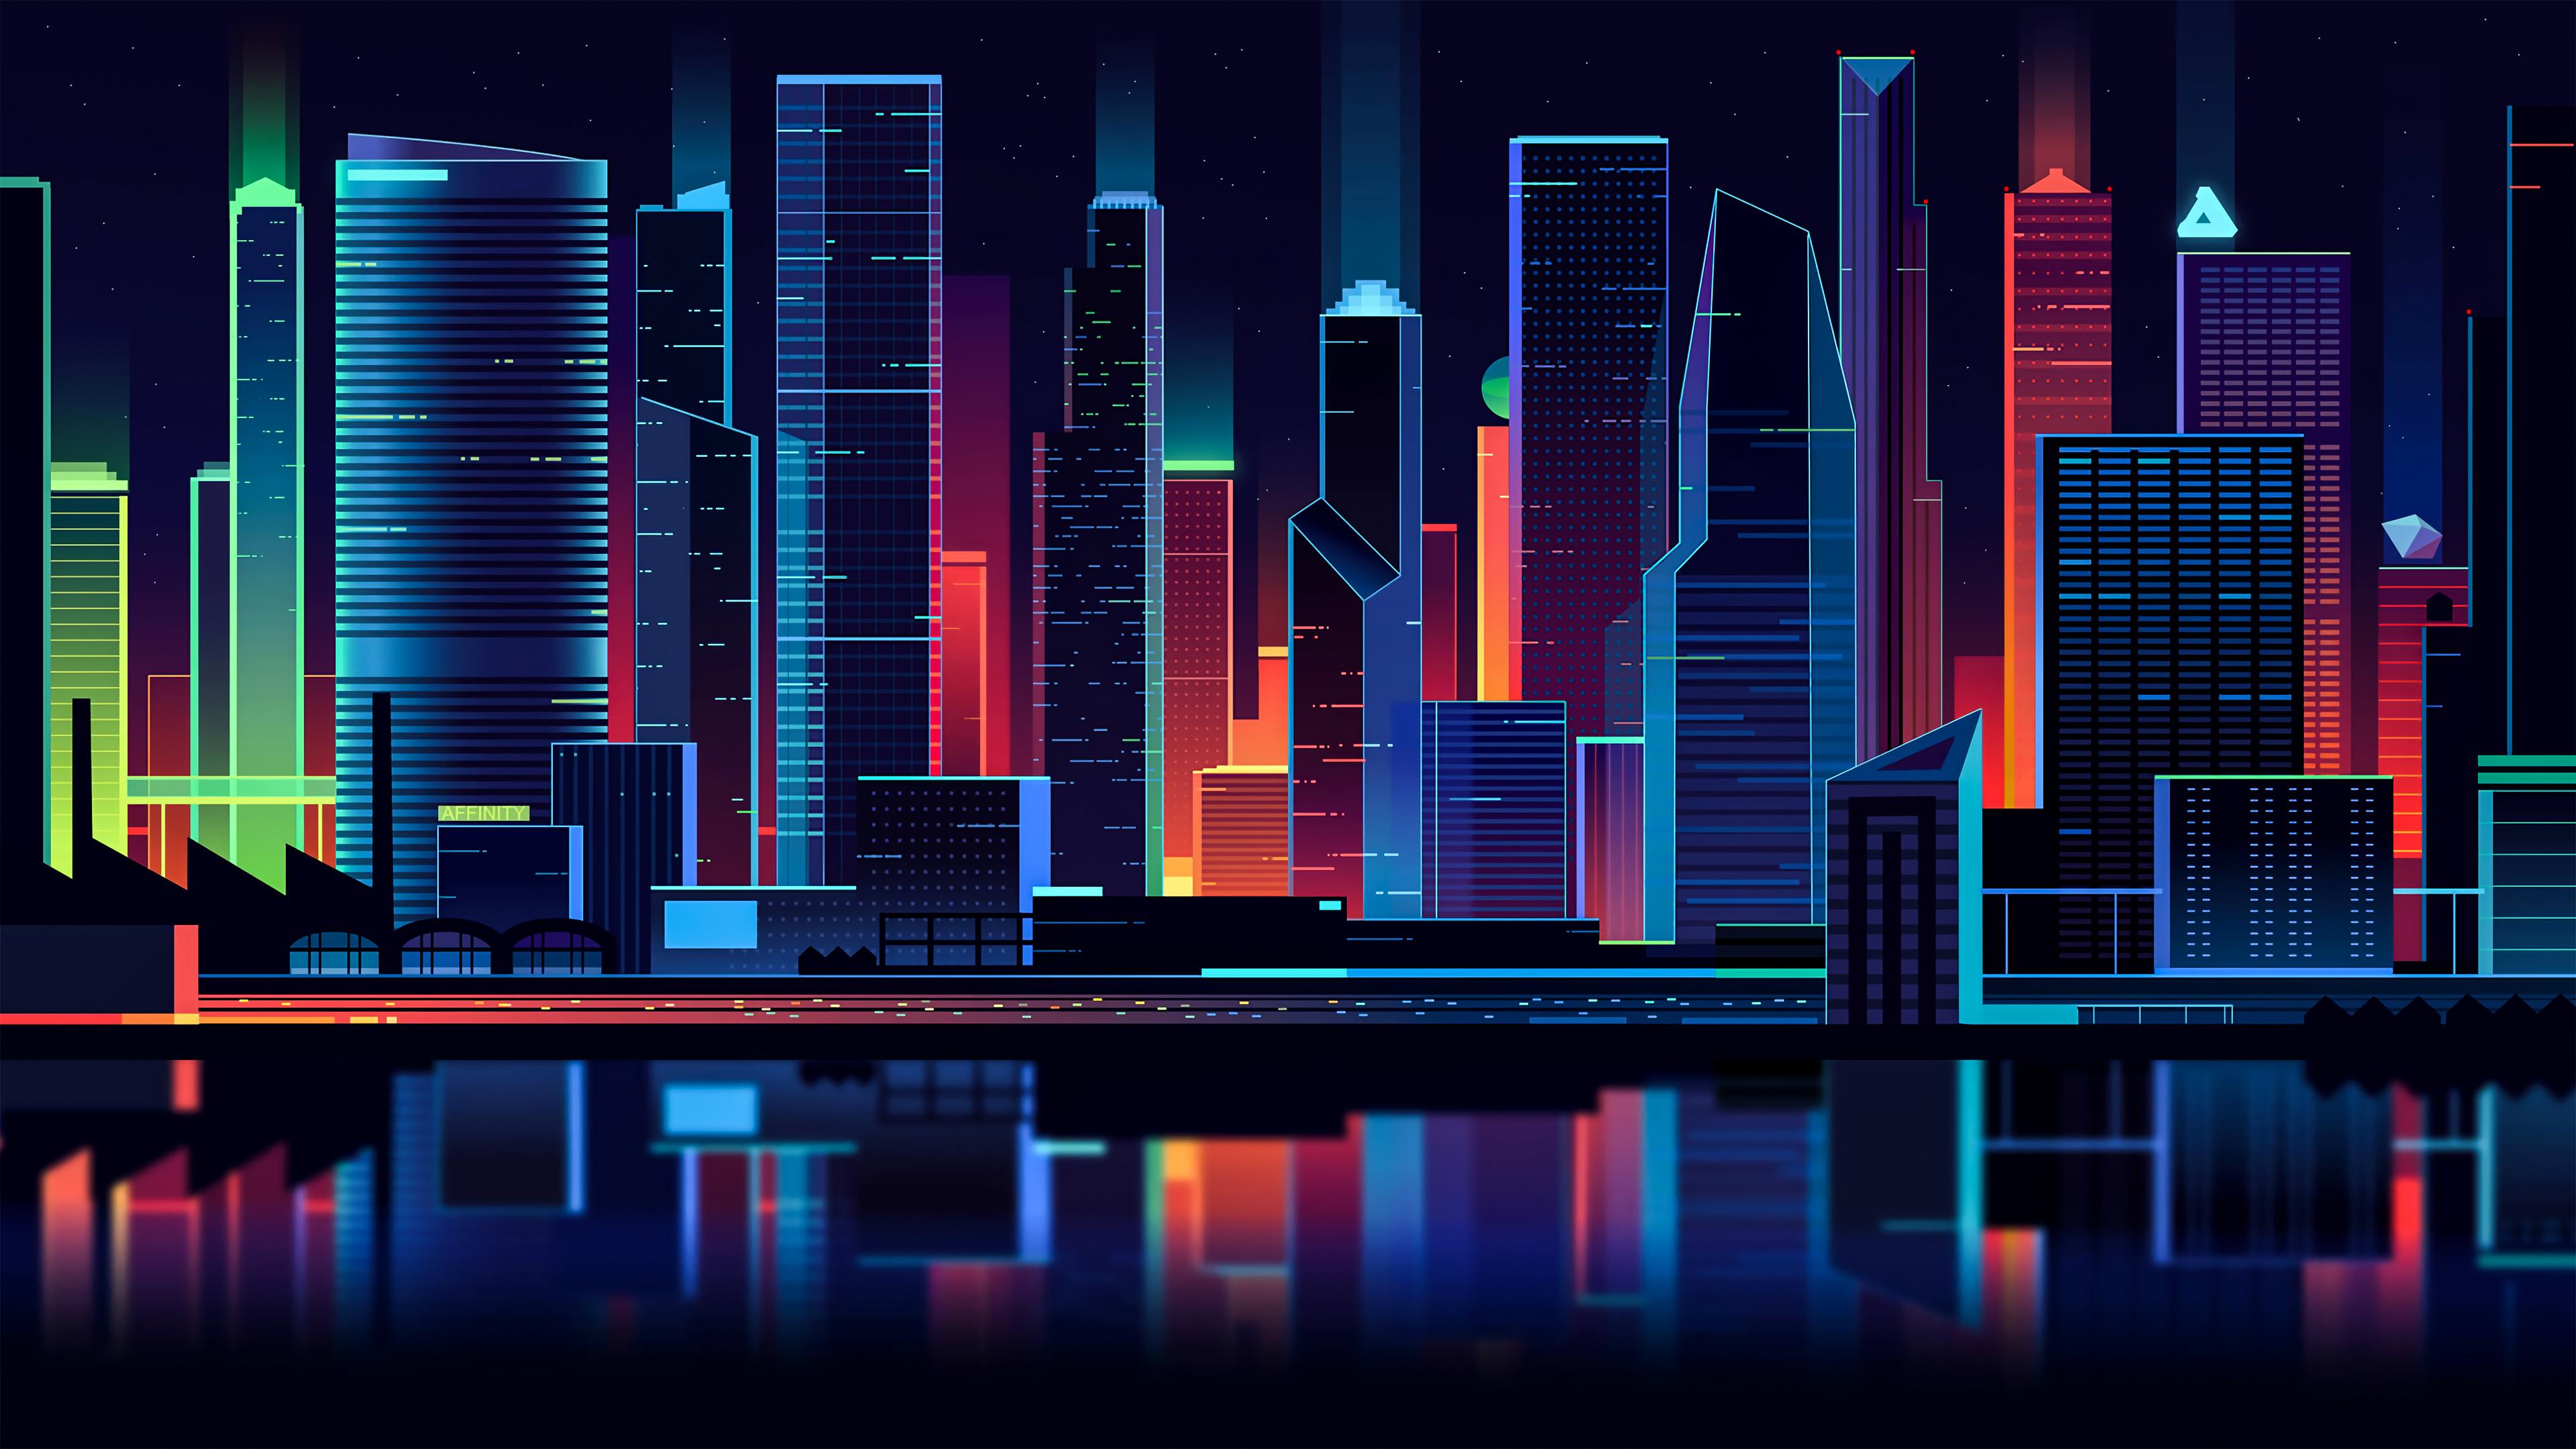 General 3840x2160 digital digital art artwork retro style neon neon lights lights city city lights water building architecture modern skyscraper tower cityscape vector art vector graphics Romain Trystram